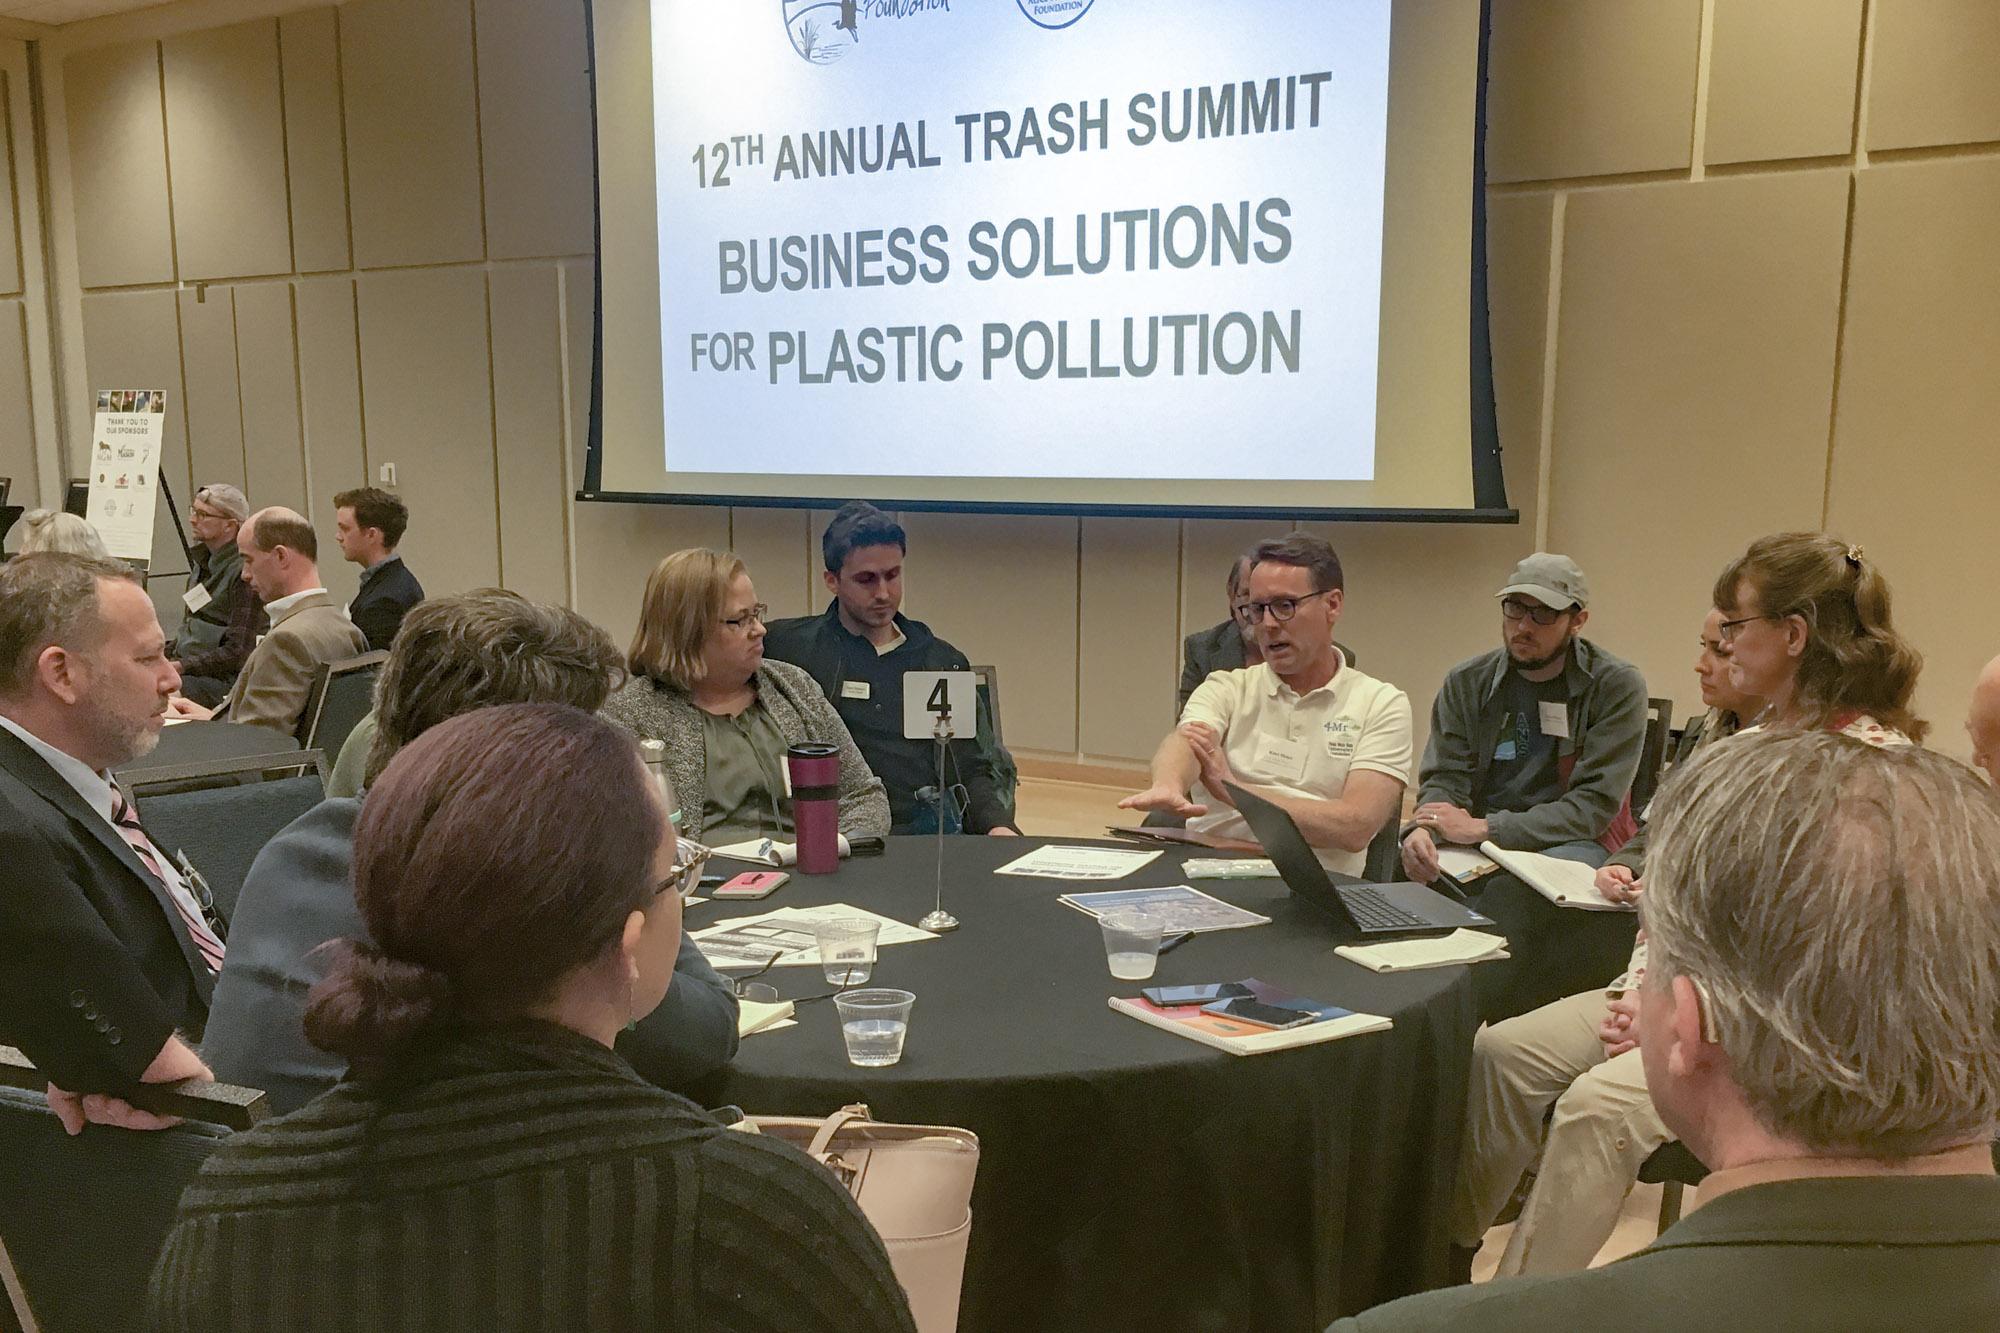 Micro plastics round table. Photo courtesy of AFF